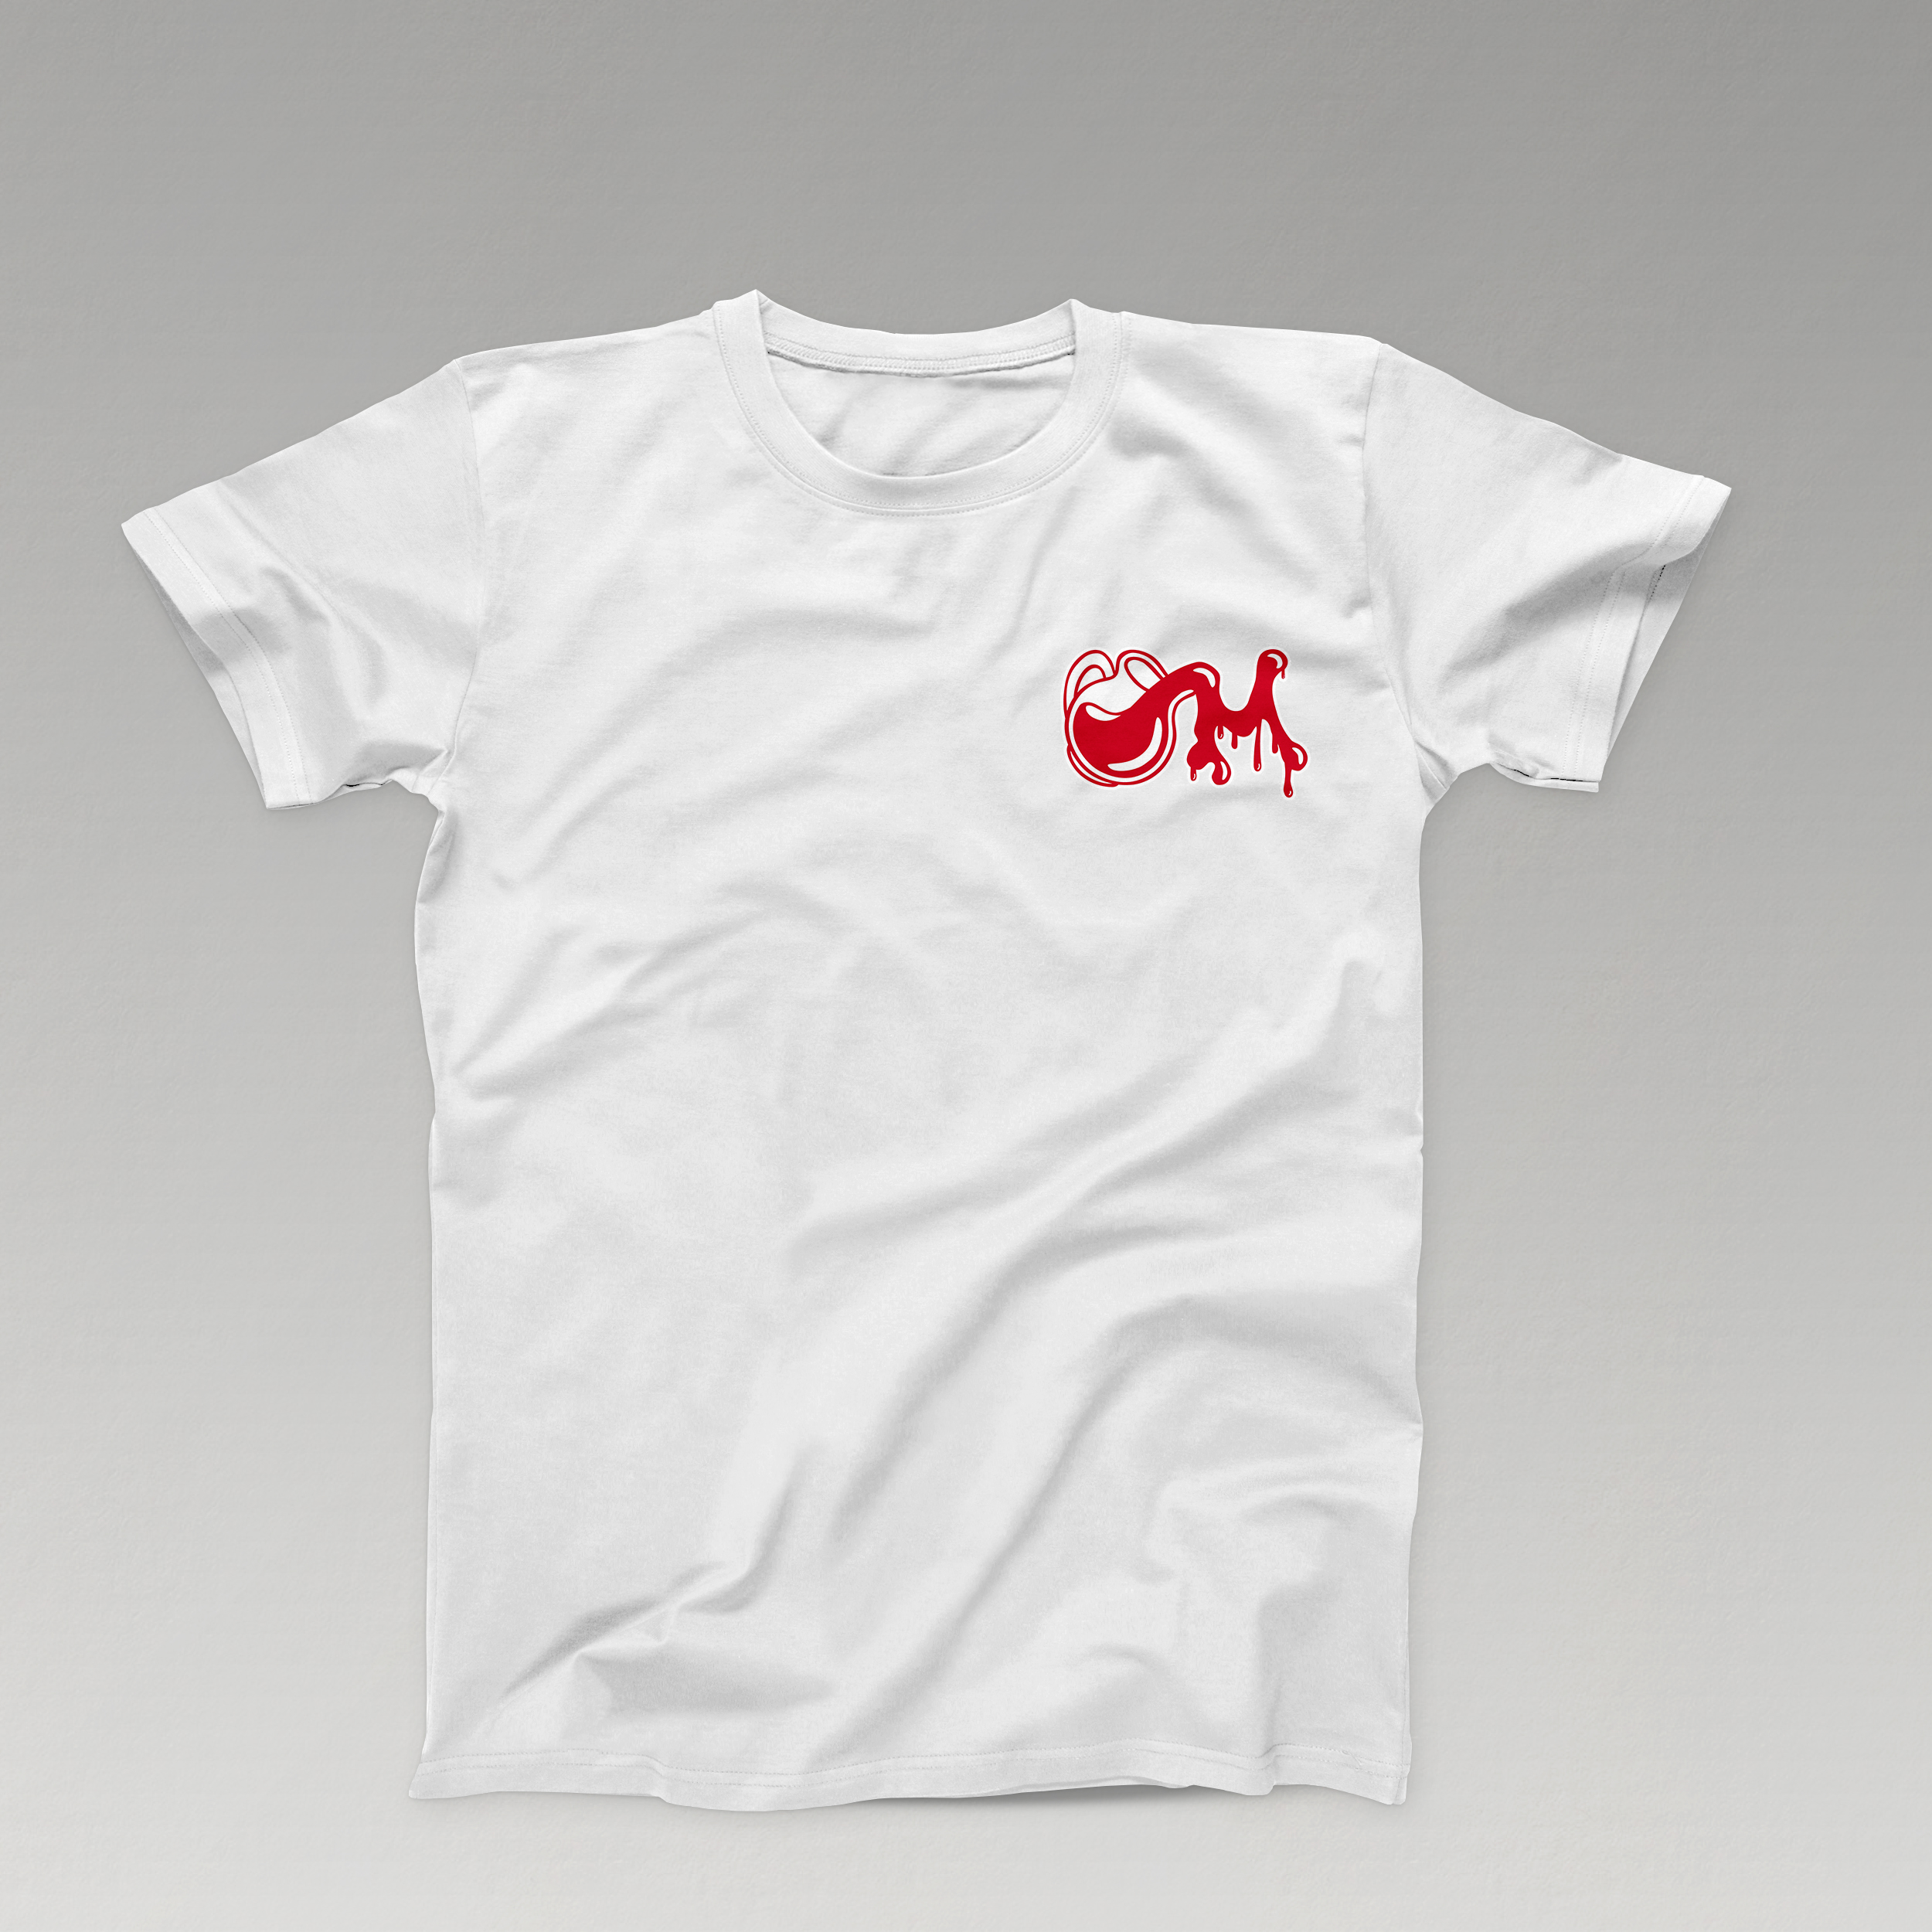 Spill_Flat_Red_-_White_Shirt.jpg